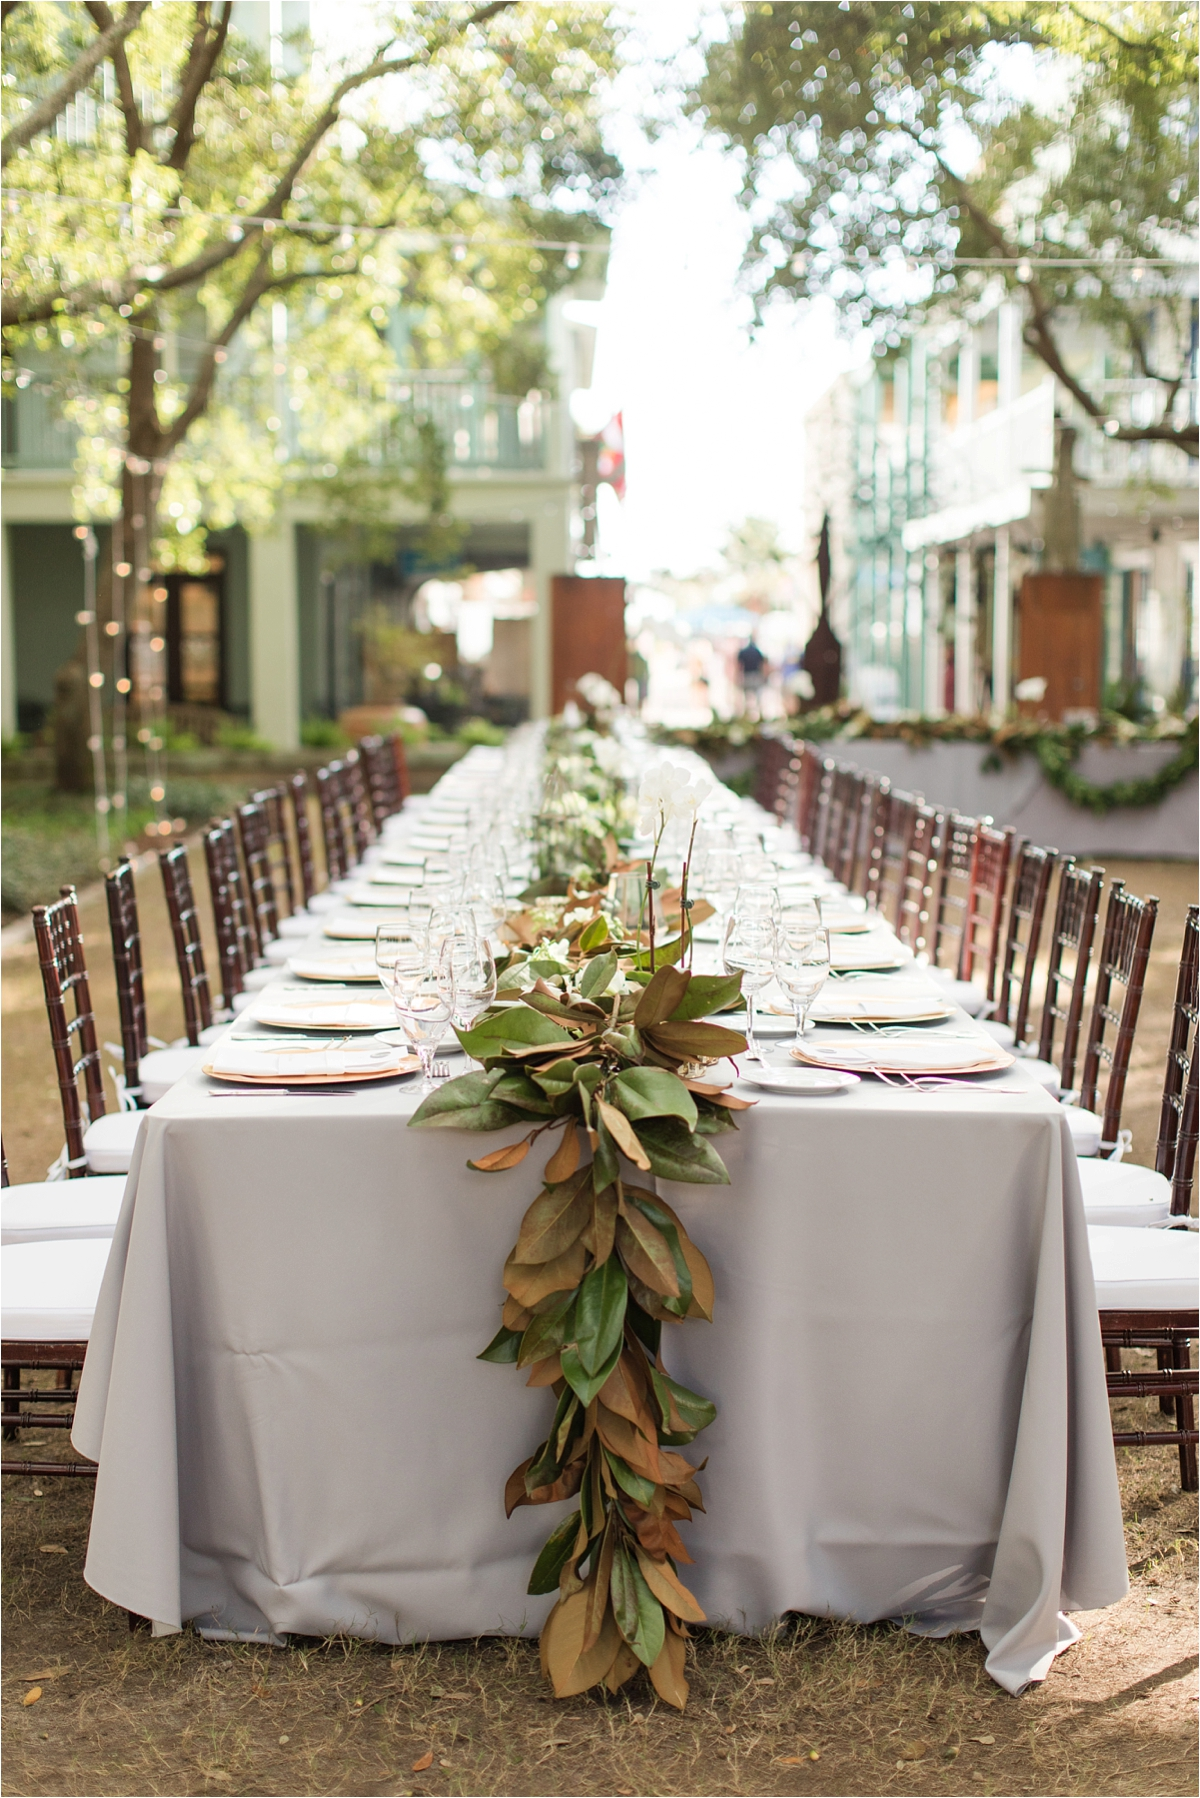 Seaside Florida Wedding Photographer-Catherine Carter + Brian-Alabama photographer-Beach wedding-Wedding venue-Wedding reception-Wedding details